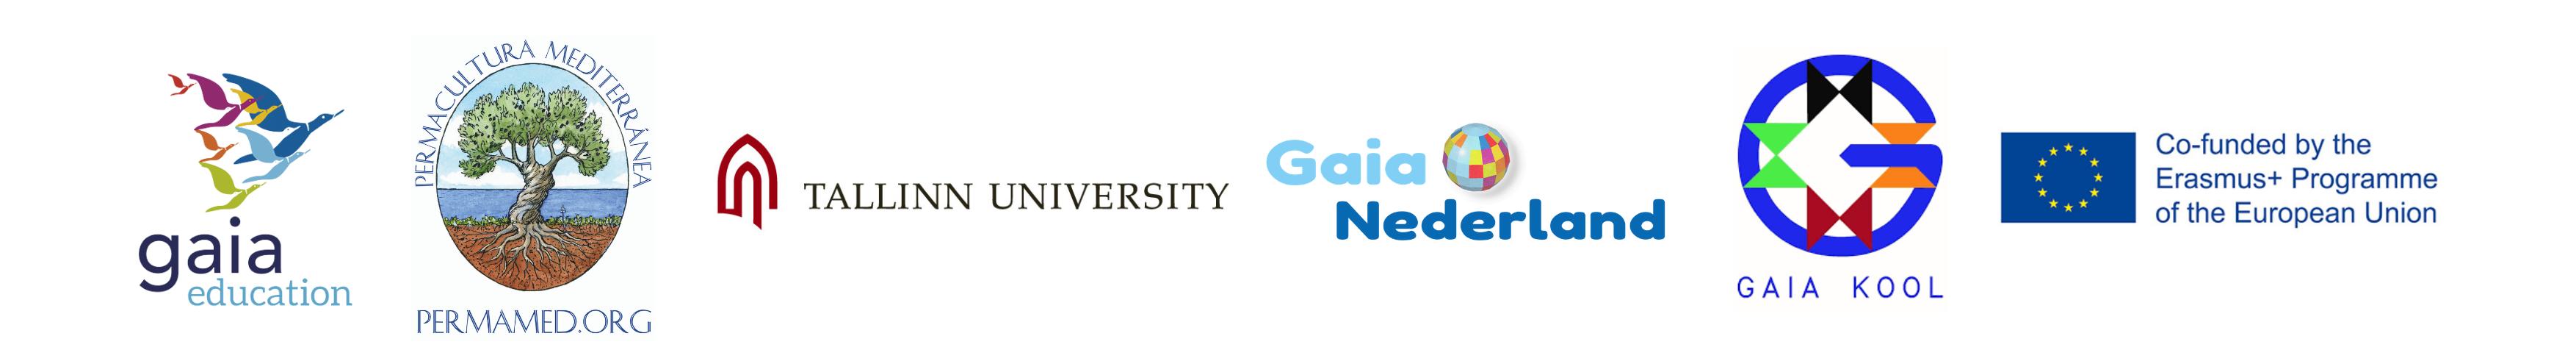 Estonia webpage banner